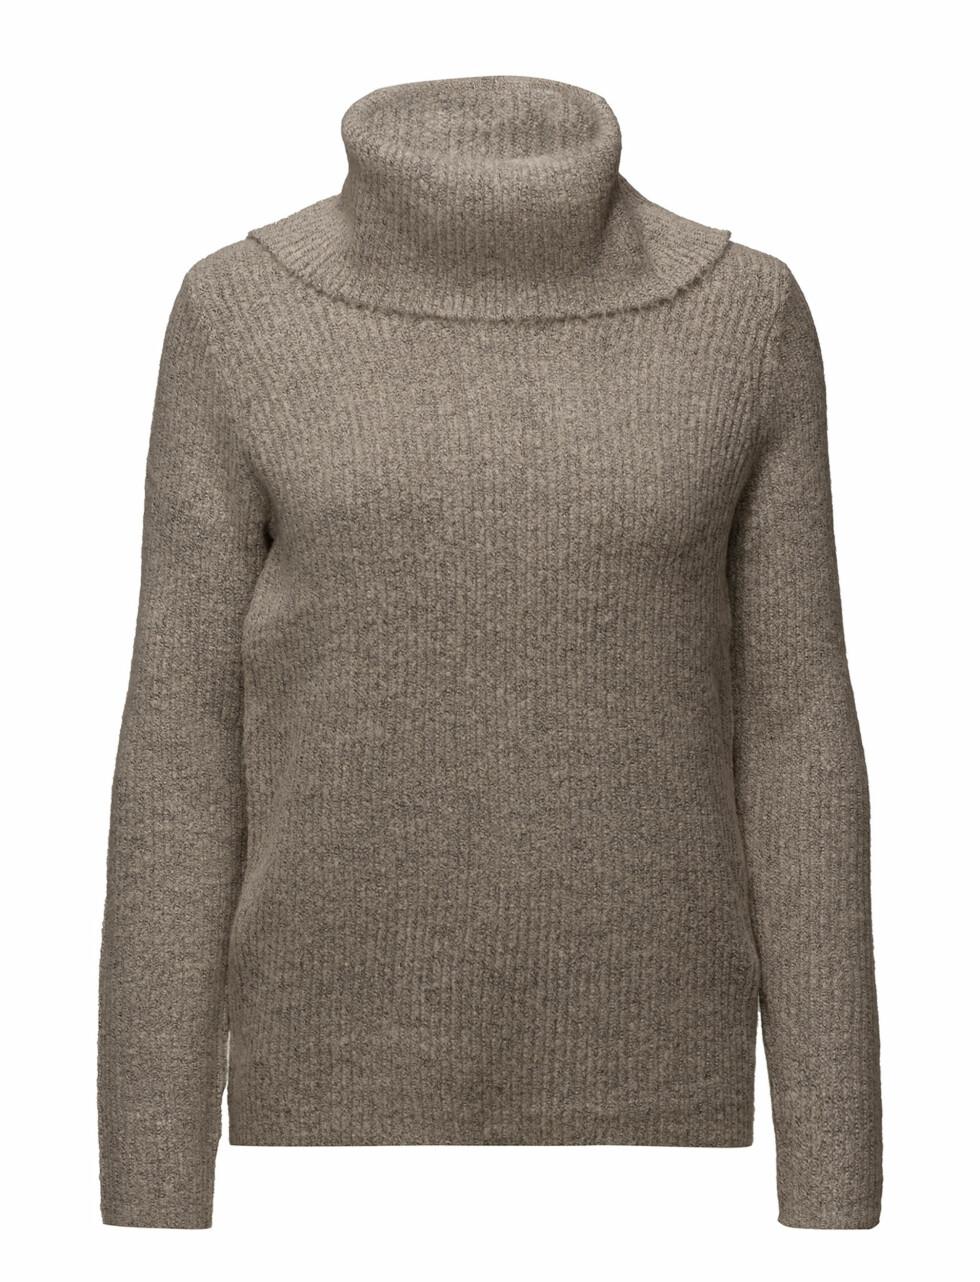 Genser fra Vila via Boozt |299,-| https://www.boozt.com/no/no/vila/vinanine-l-s-cowlneck-knit-top_16649228/16649231?navId=67396&group=listing&position=1000000